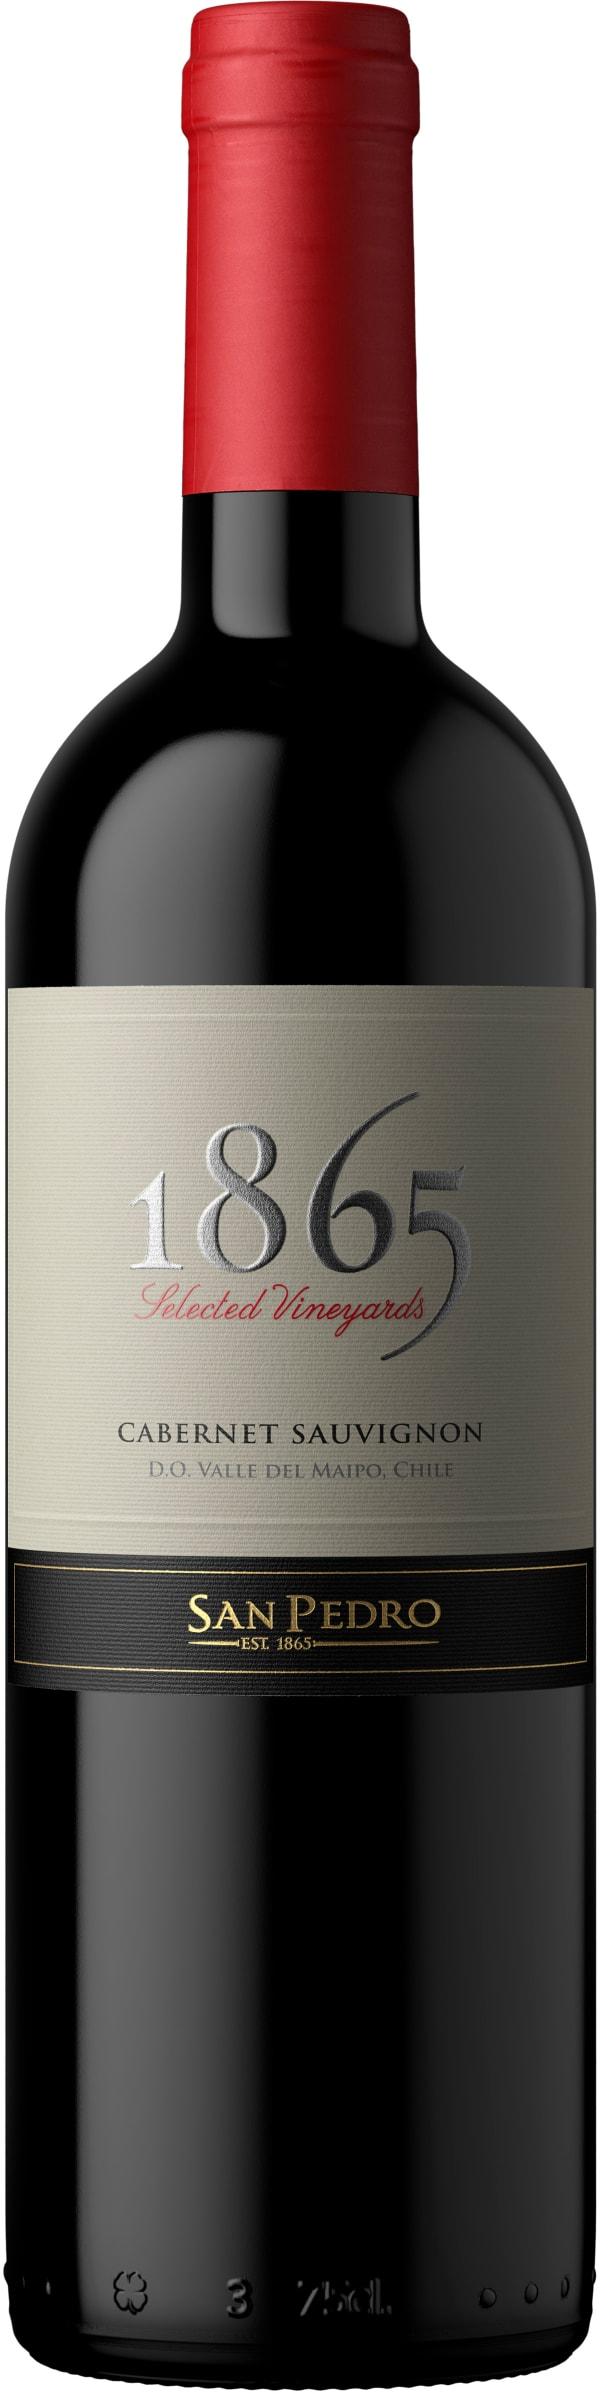 1865 Single Vineyard Cabernet Sauvignon 2015